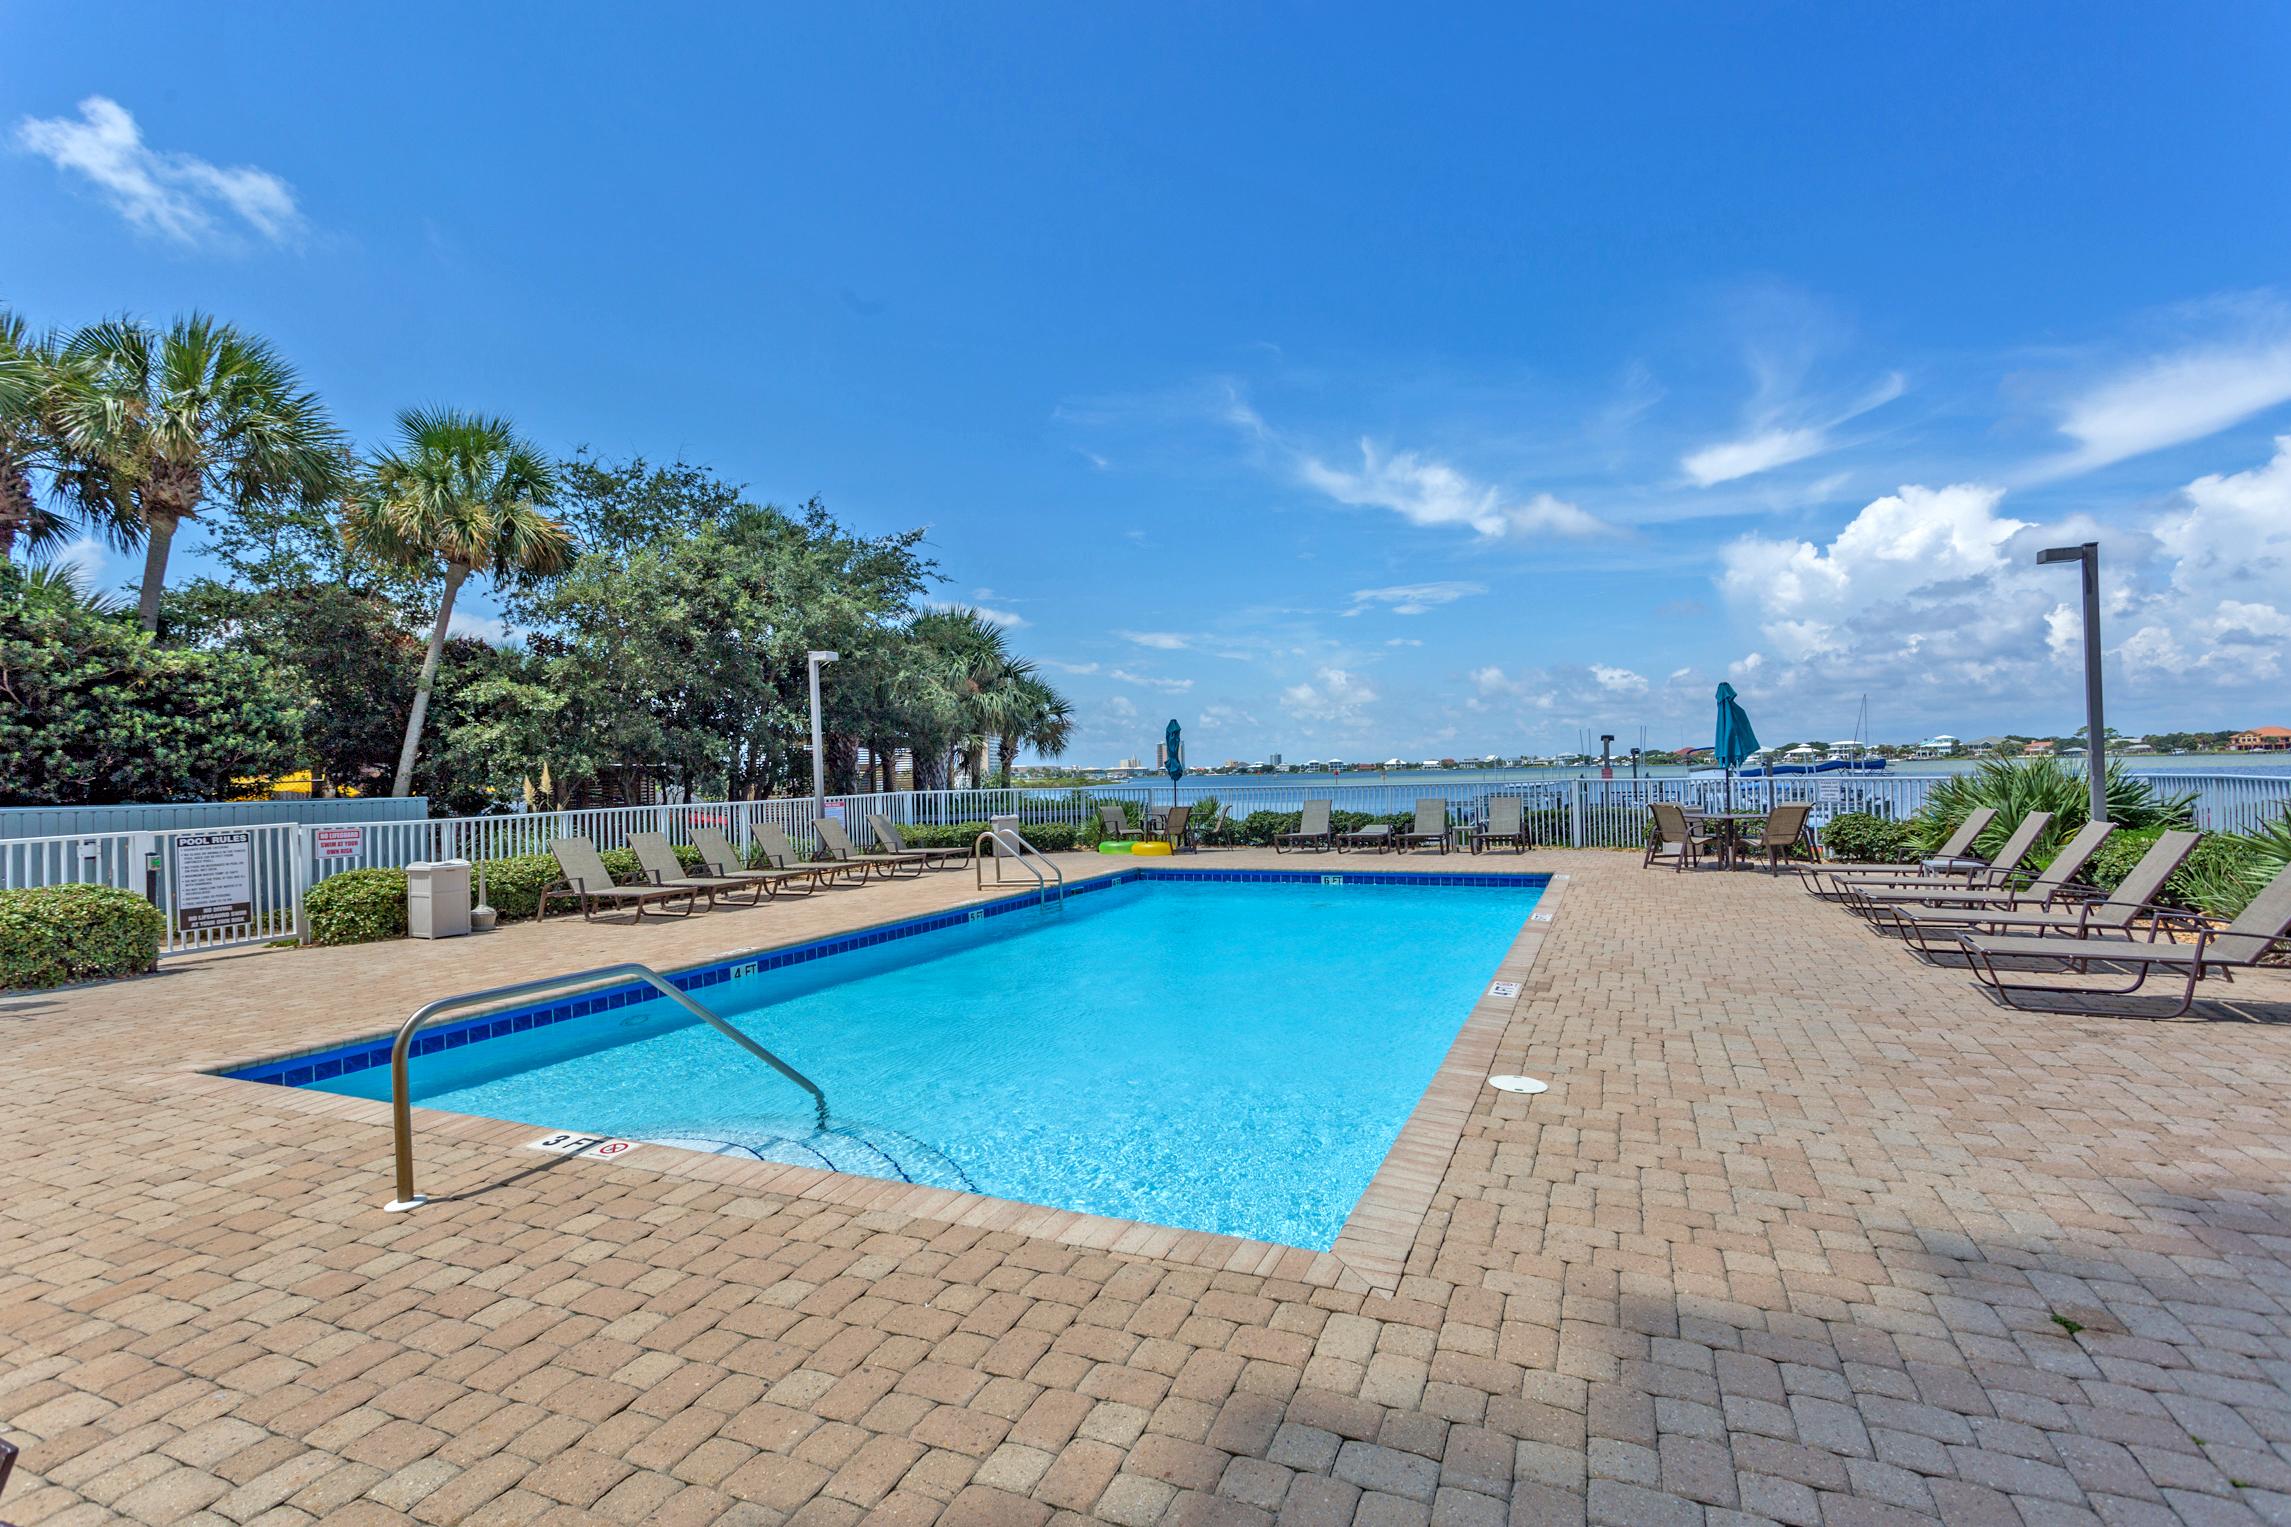 South Harbour #7E Condo rental in South Harbour ~ Pensacola Beach Vacation Rentals by BeachGuide in Pensacola Beach Florida - #21